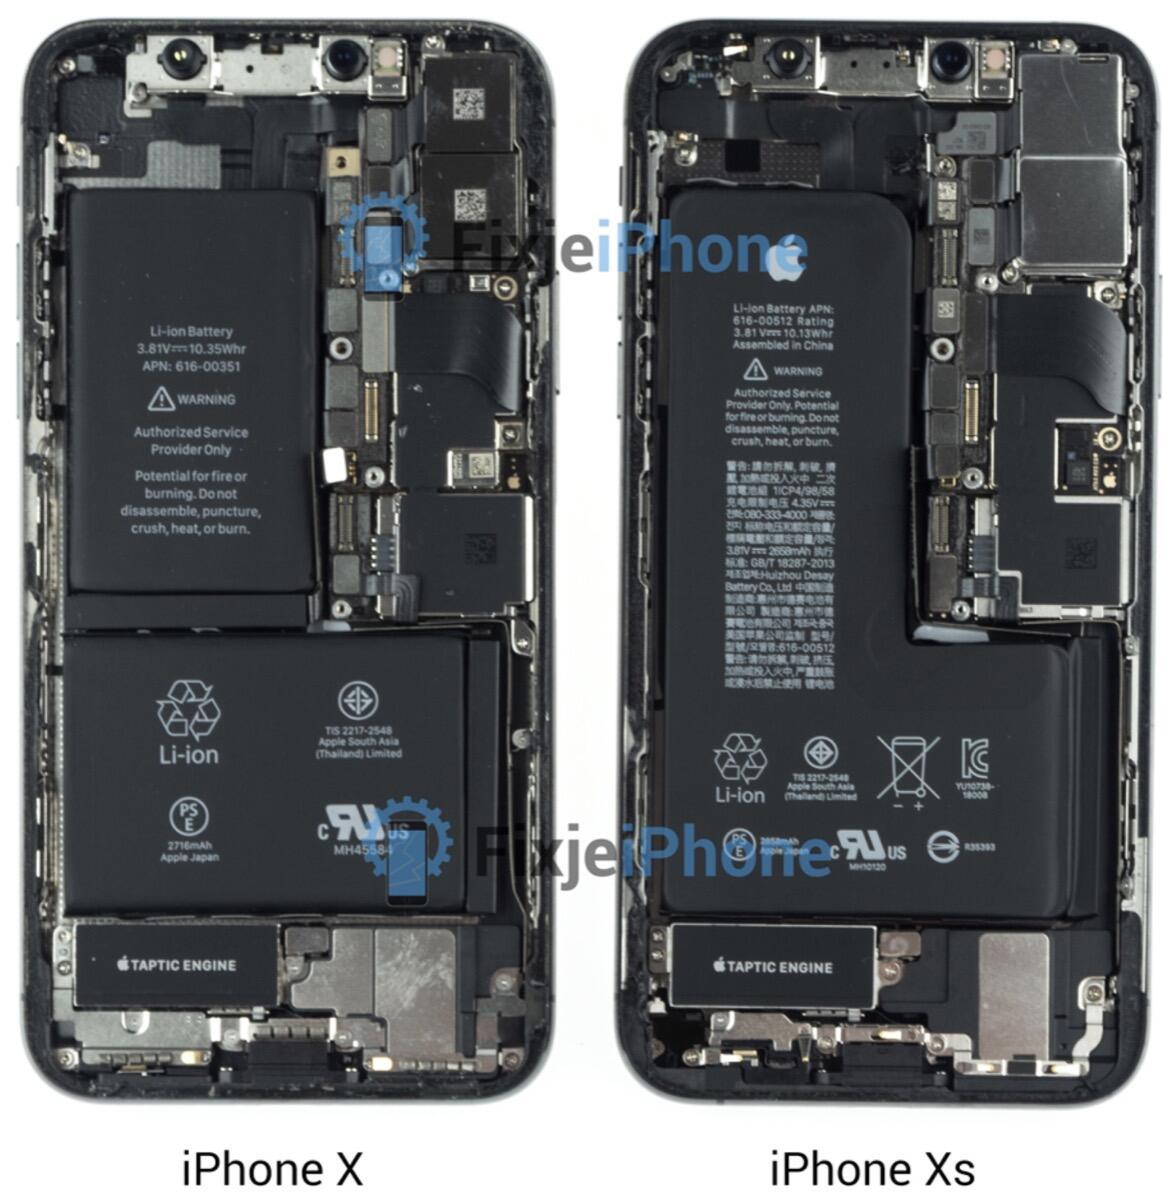 Iphone Xs Teardown Vs